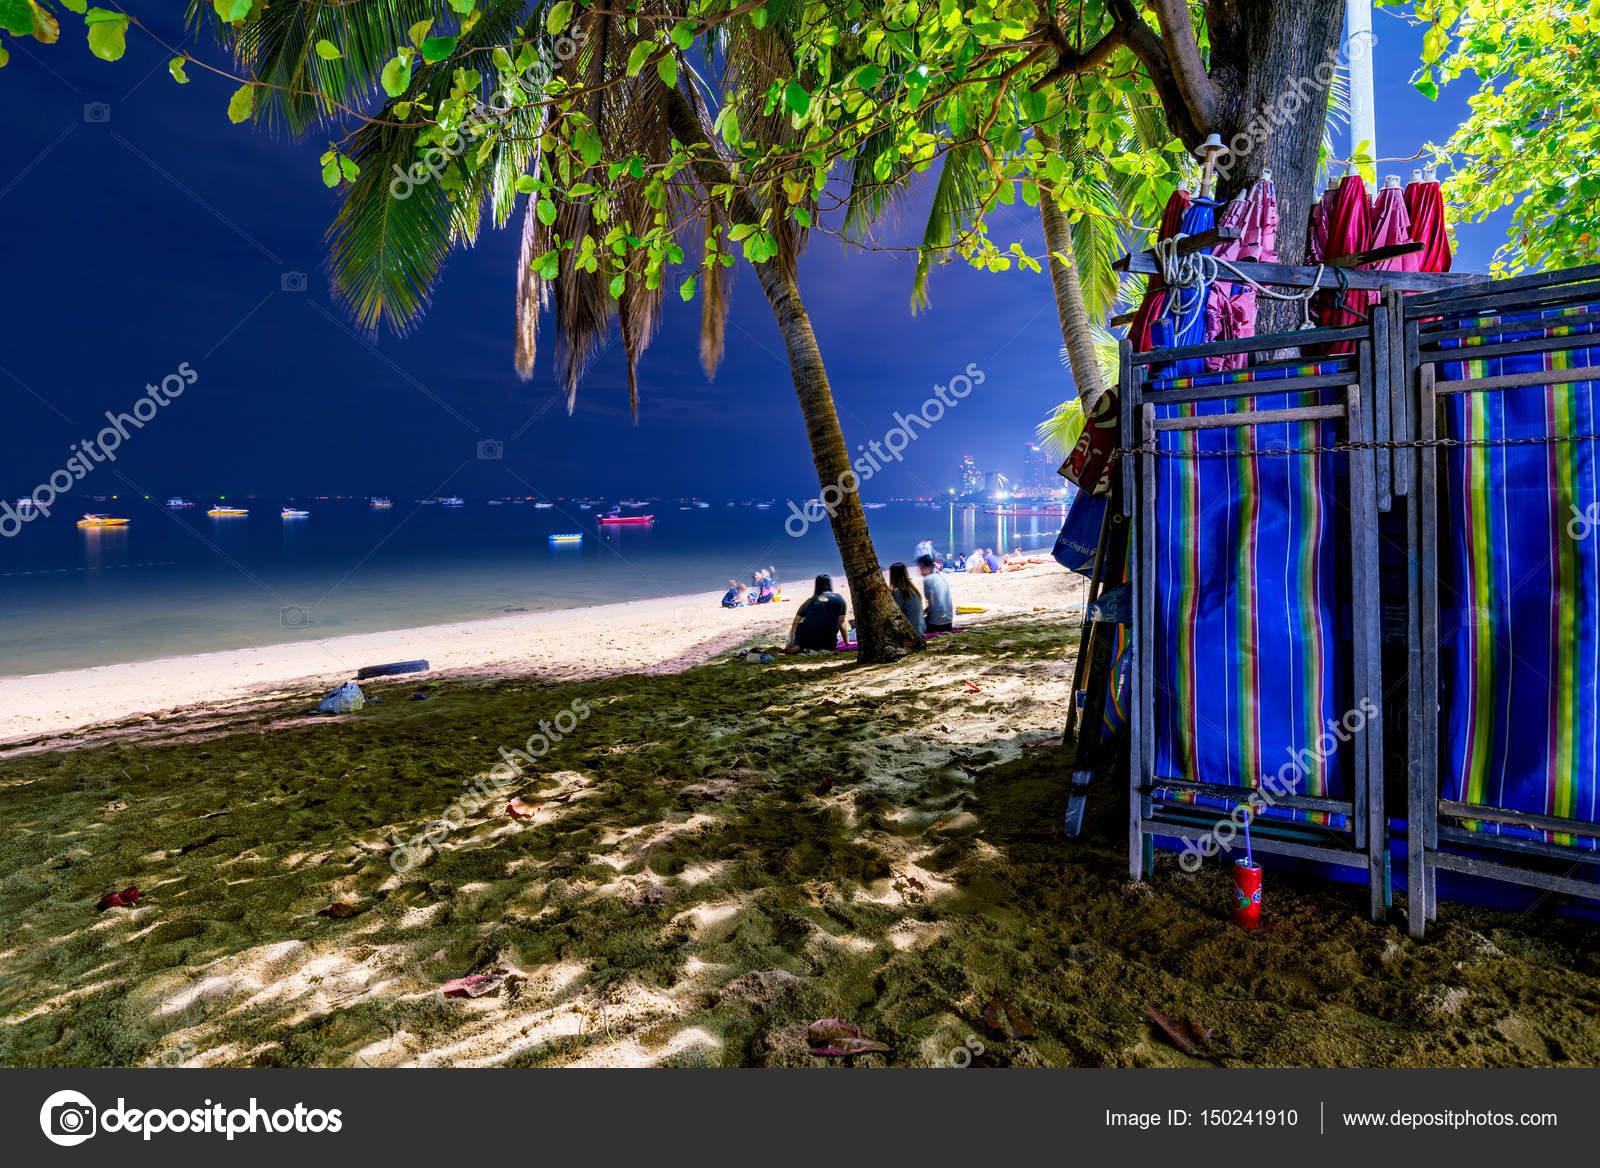 Pattaya Beach Deck Chairs At Night With Sea Stock Editorial Photo C Asiastock 150241910